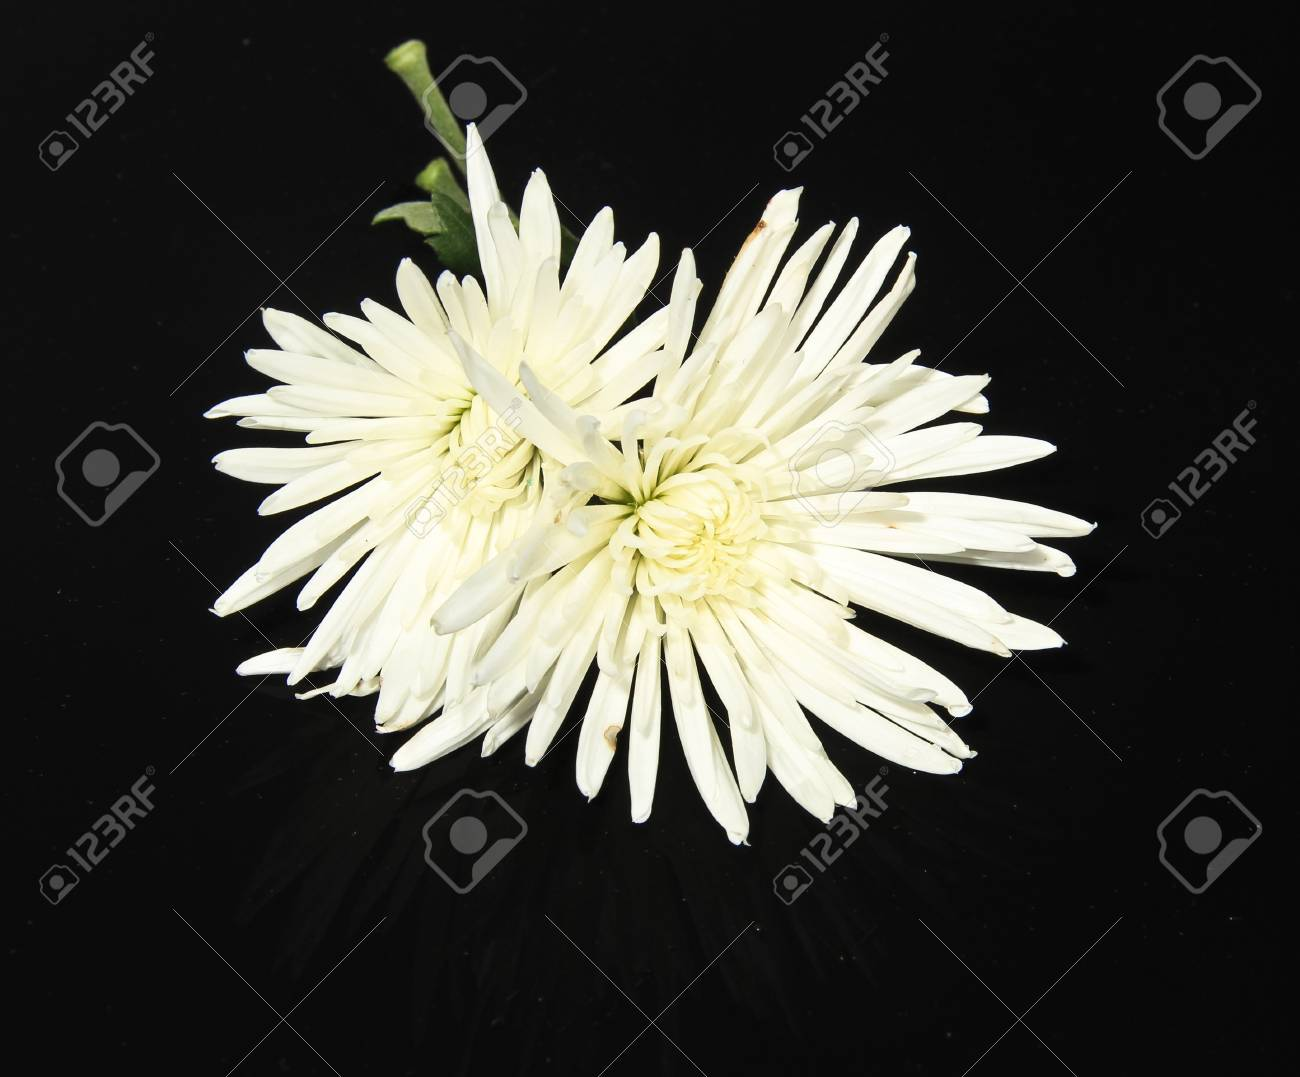 This Photo Is Close Up Of White Chrysanthemum Flower Stock Photo